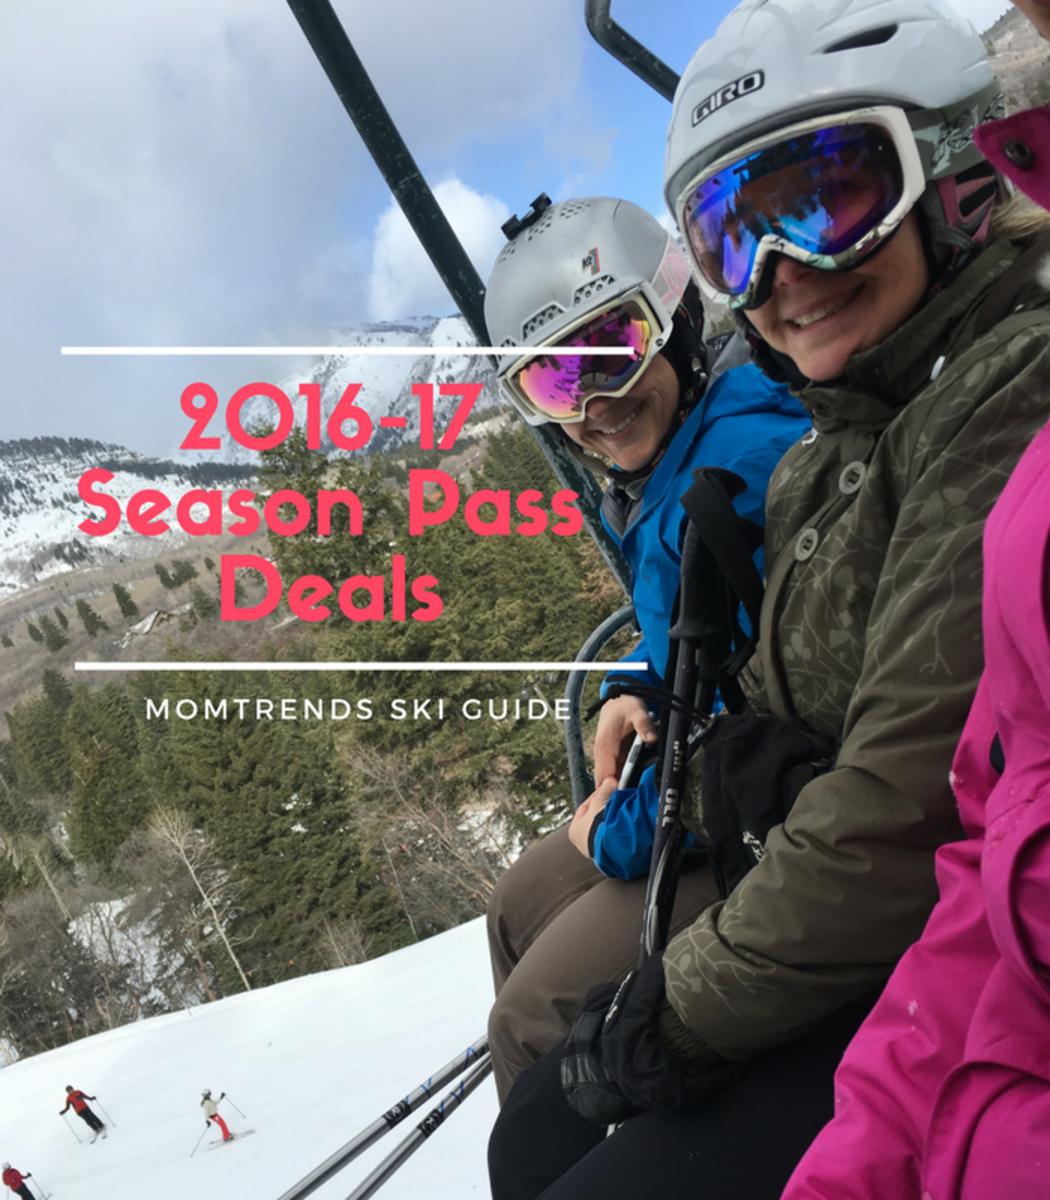 Ski season pass deals tahoe / Best hybrid car lease deals